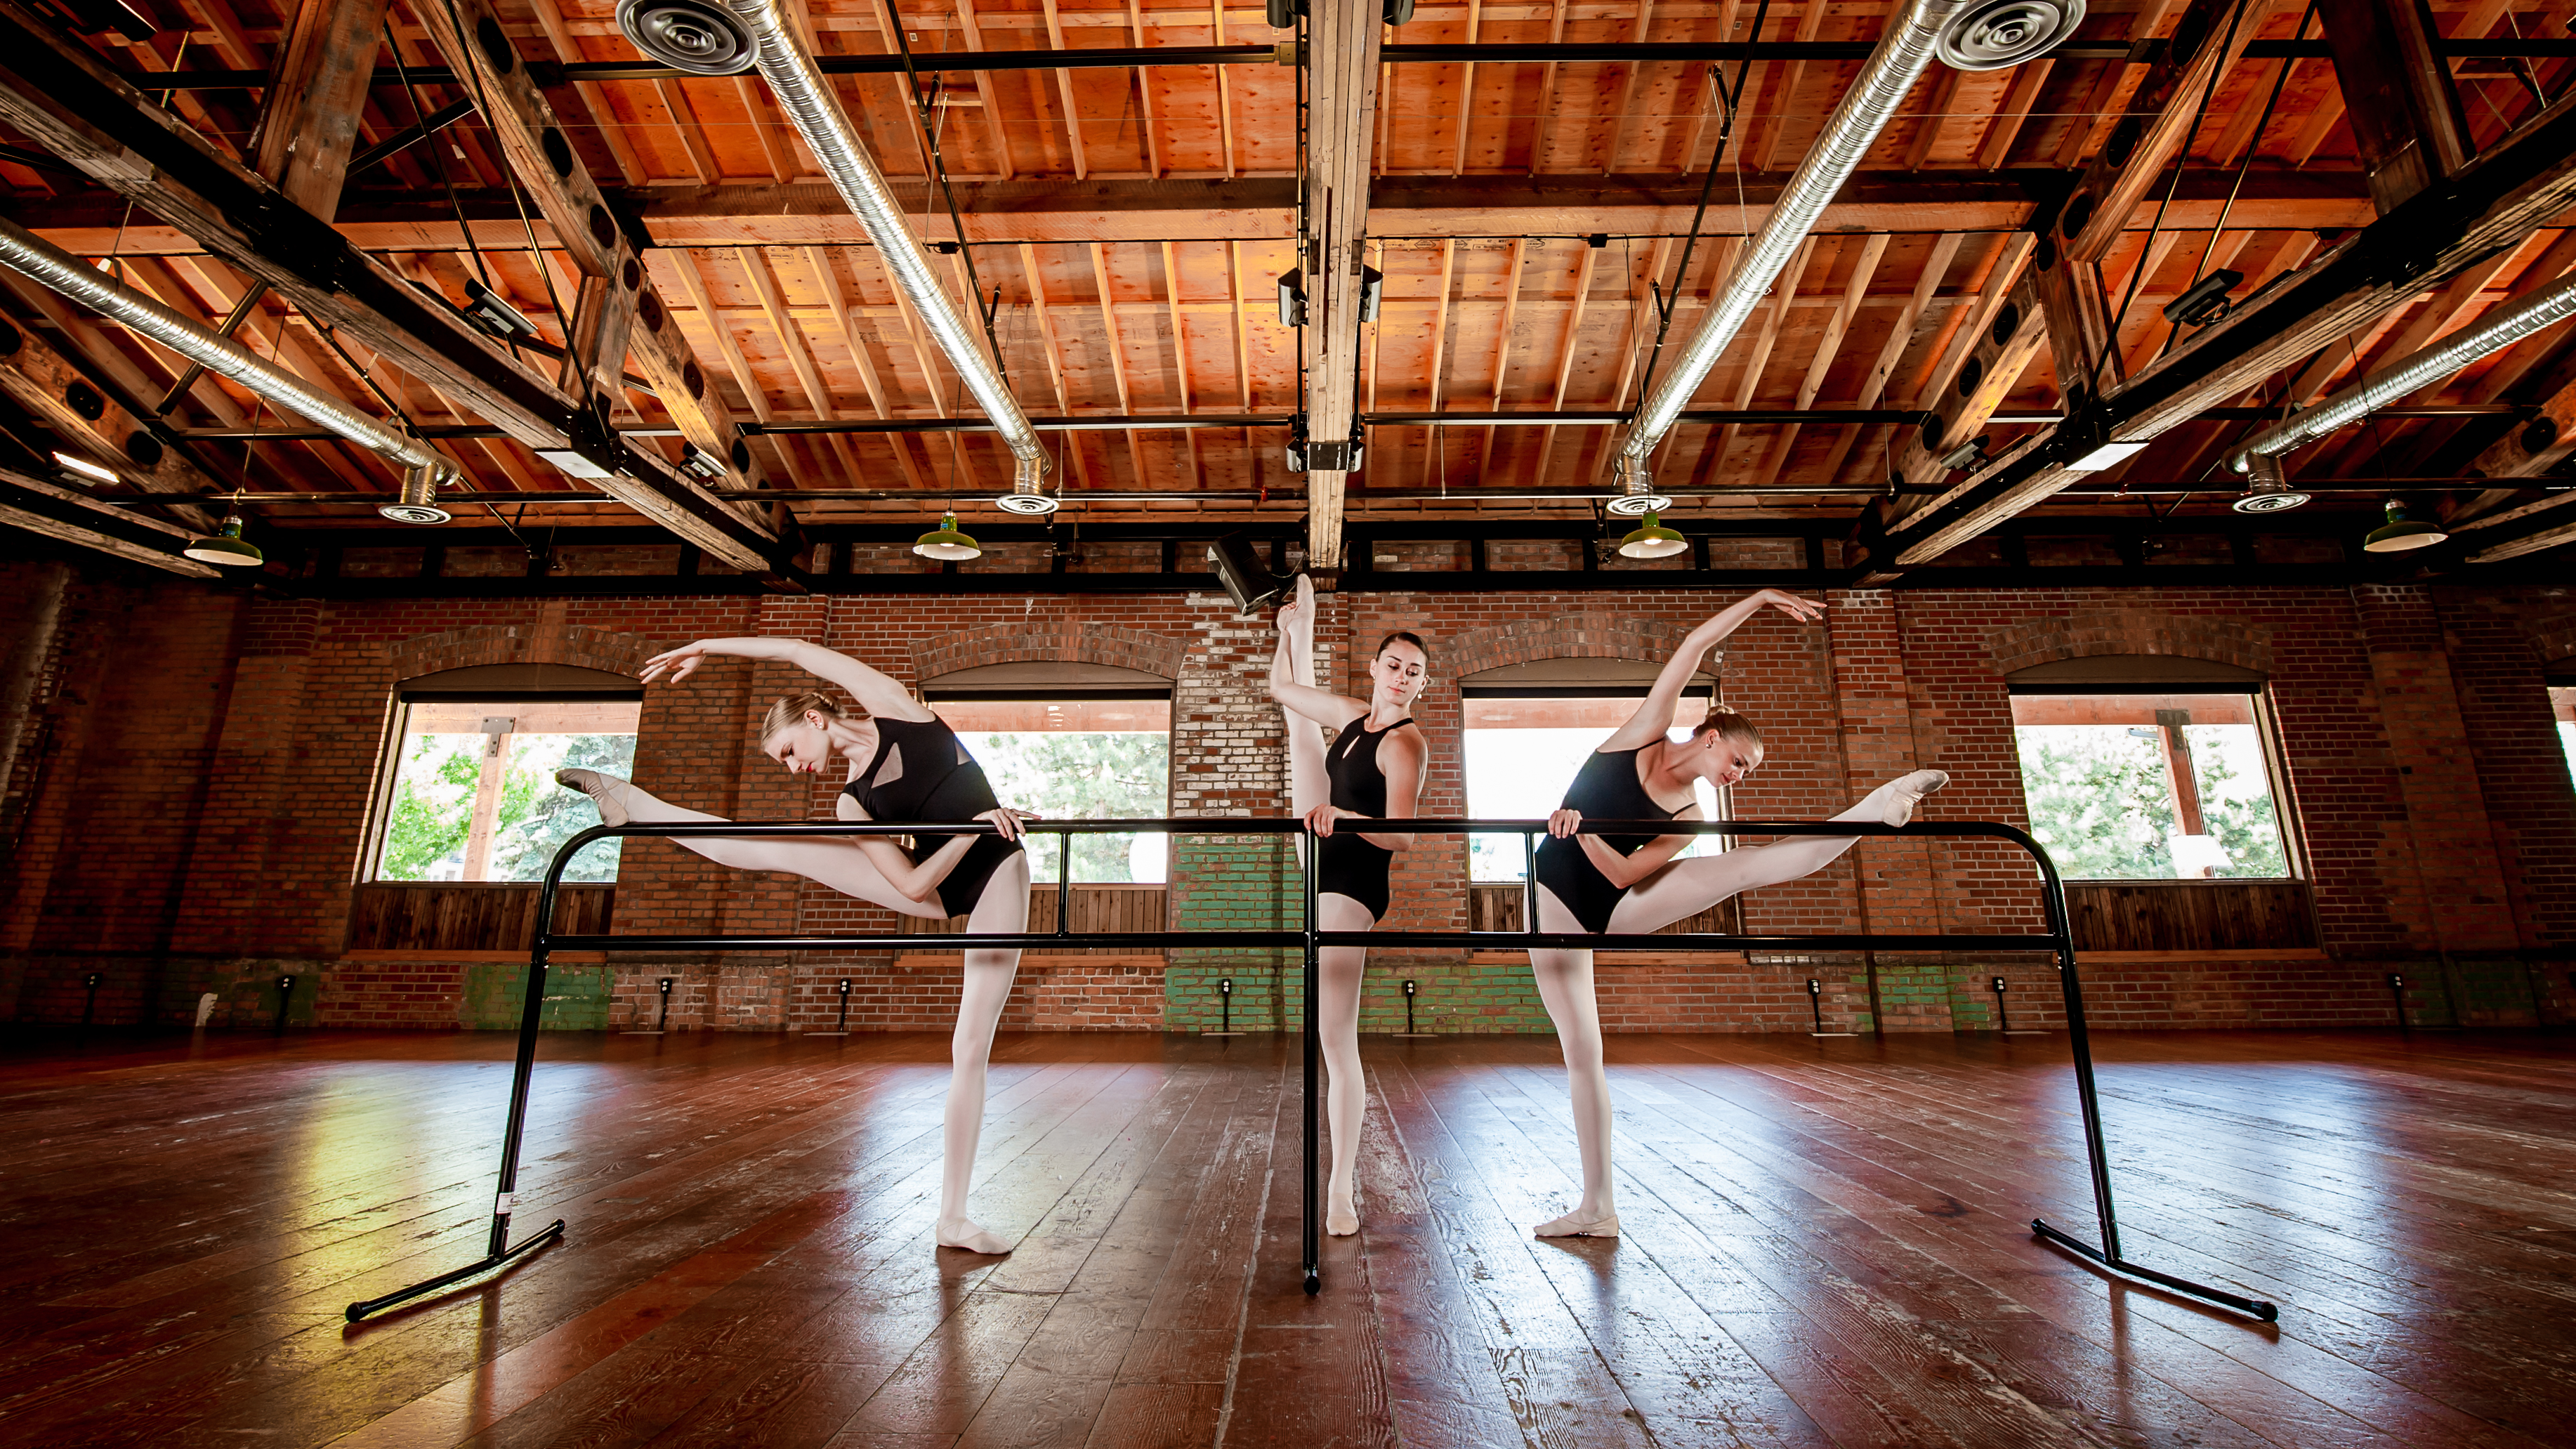 Dance Quotes - 550+ Quotes for Dancers - En Pointe